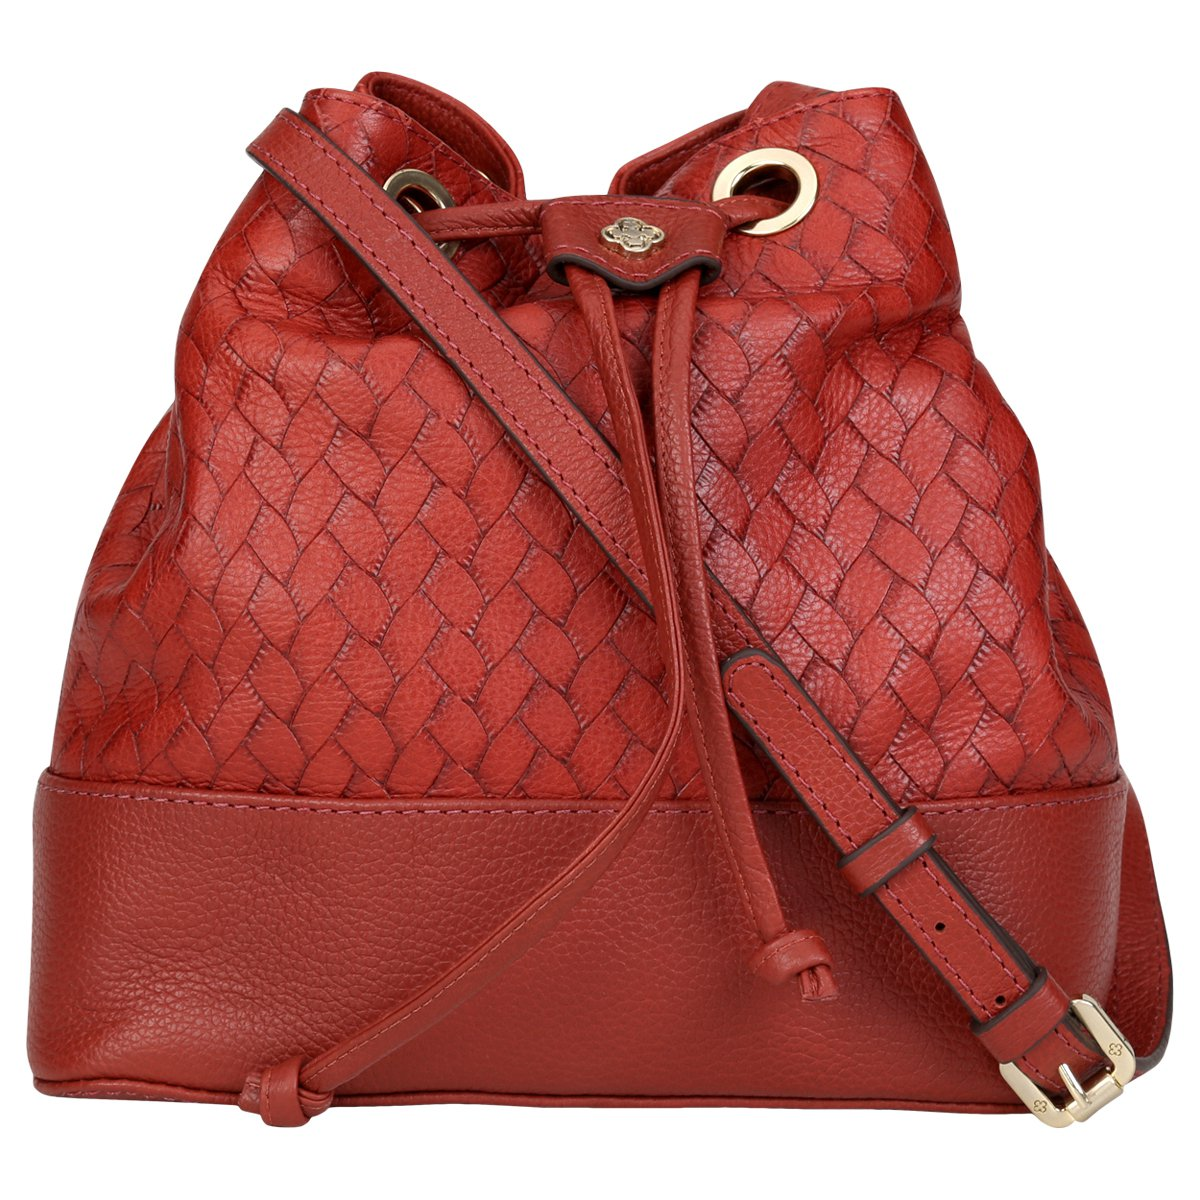 b86b34ed2 Bolsa Capodarte Saco Estampada - Compre Agora | Zattini